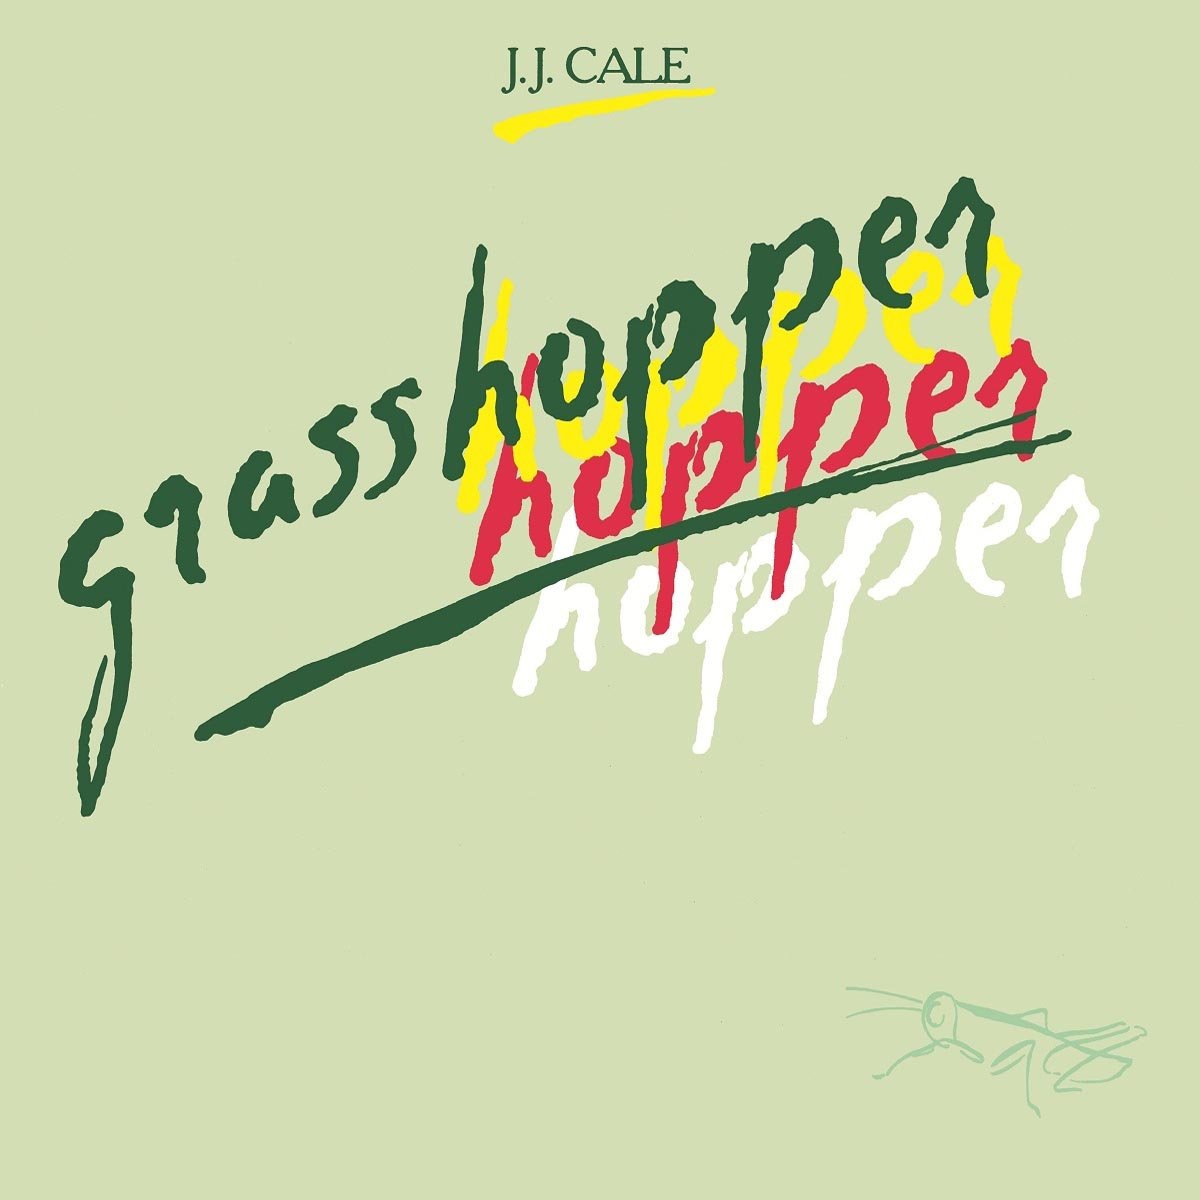 Дж.Дж. Кейл J.J. Cale. Grasshopper (LP) джон кейл john cale conflict